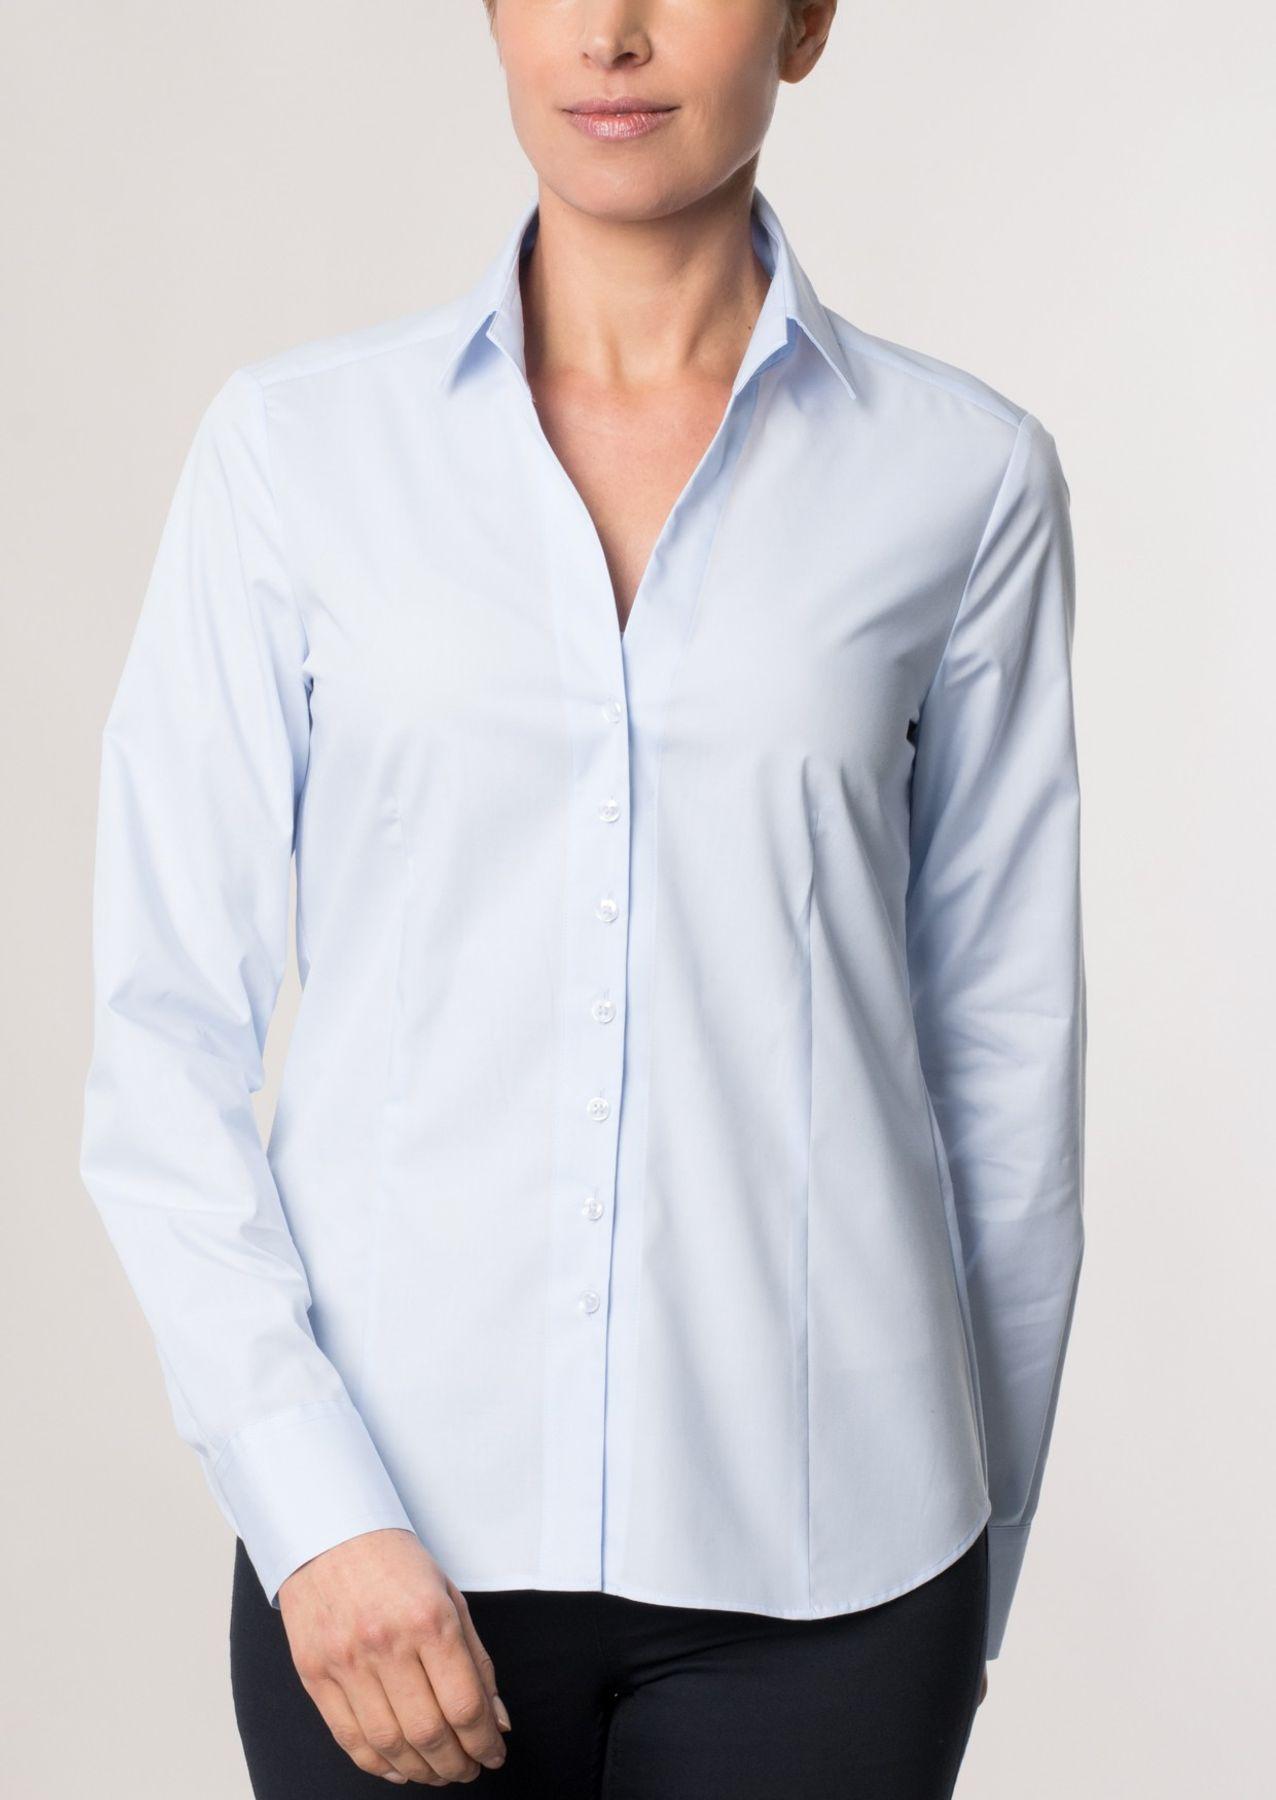 Eterna -  Comfort-Fit - Damen Langarm Bluse in Hellblau kariert  (5330 D661) – Bild 6